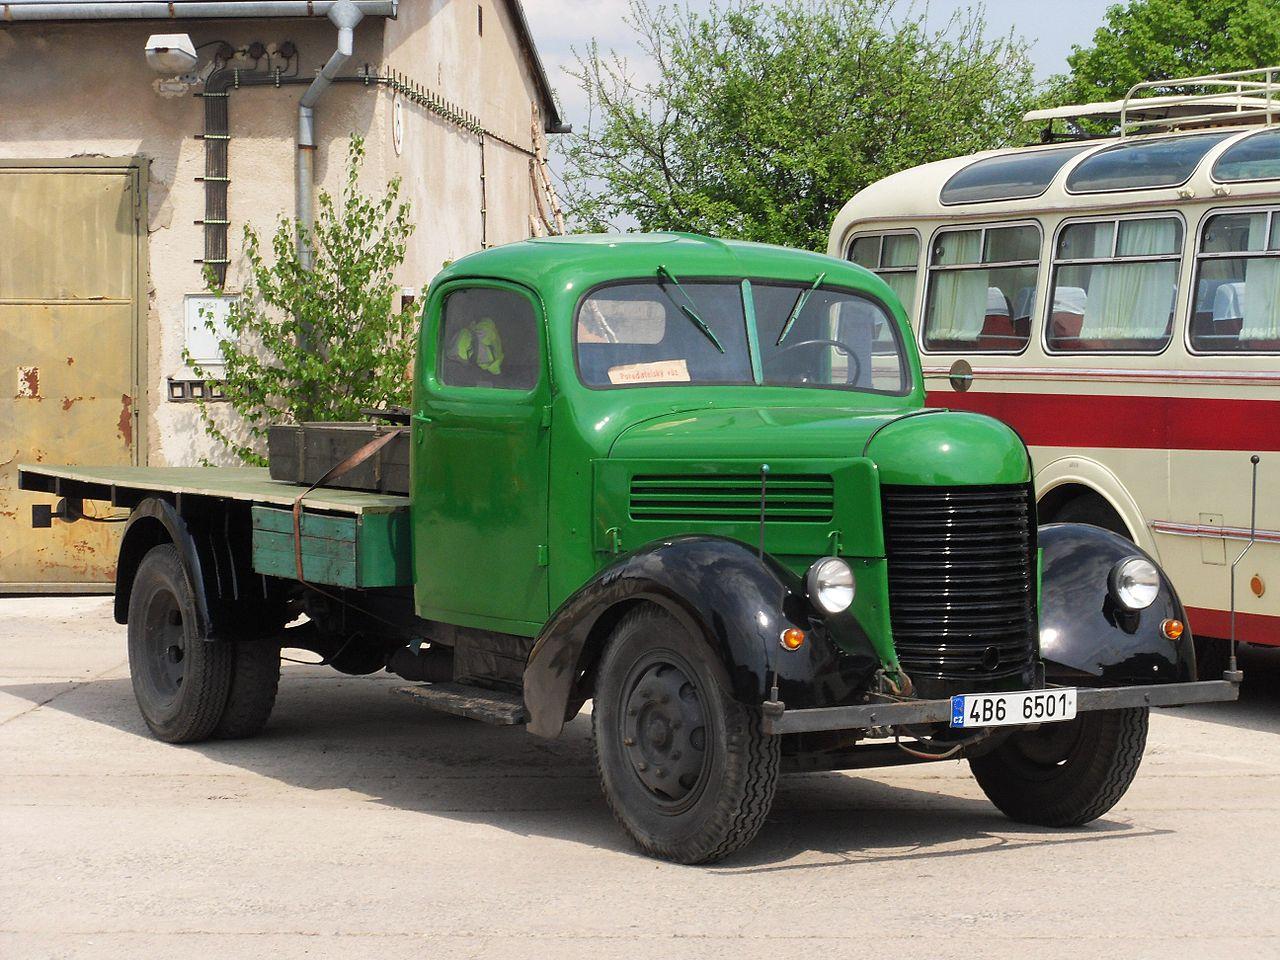 Historický automobil Praga RND, lidově nazývaný erena